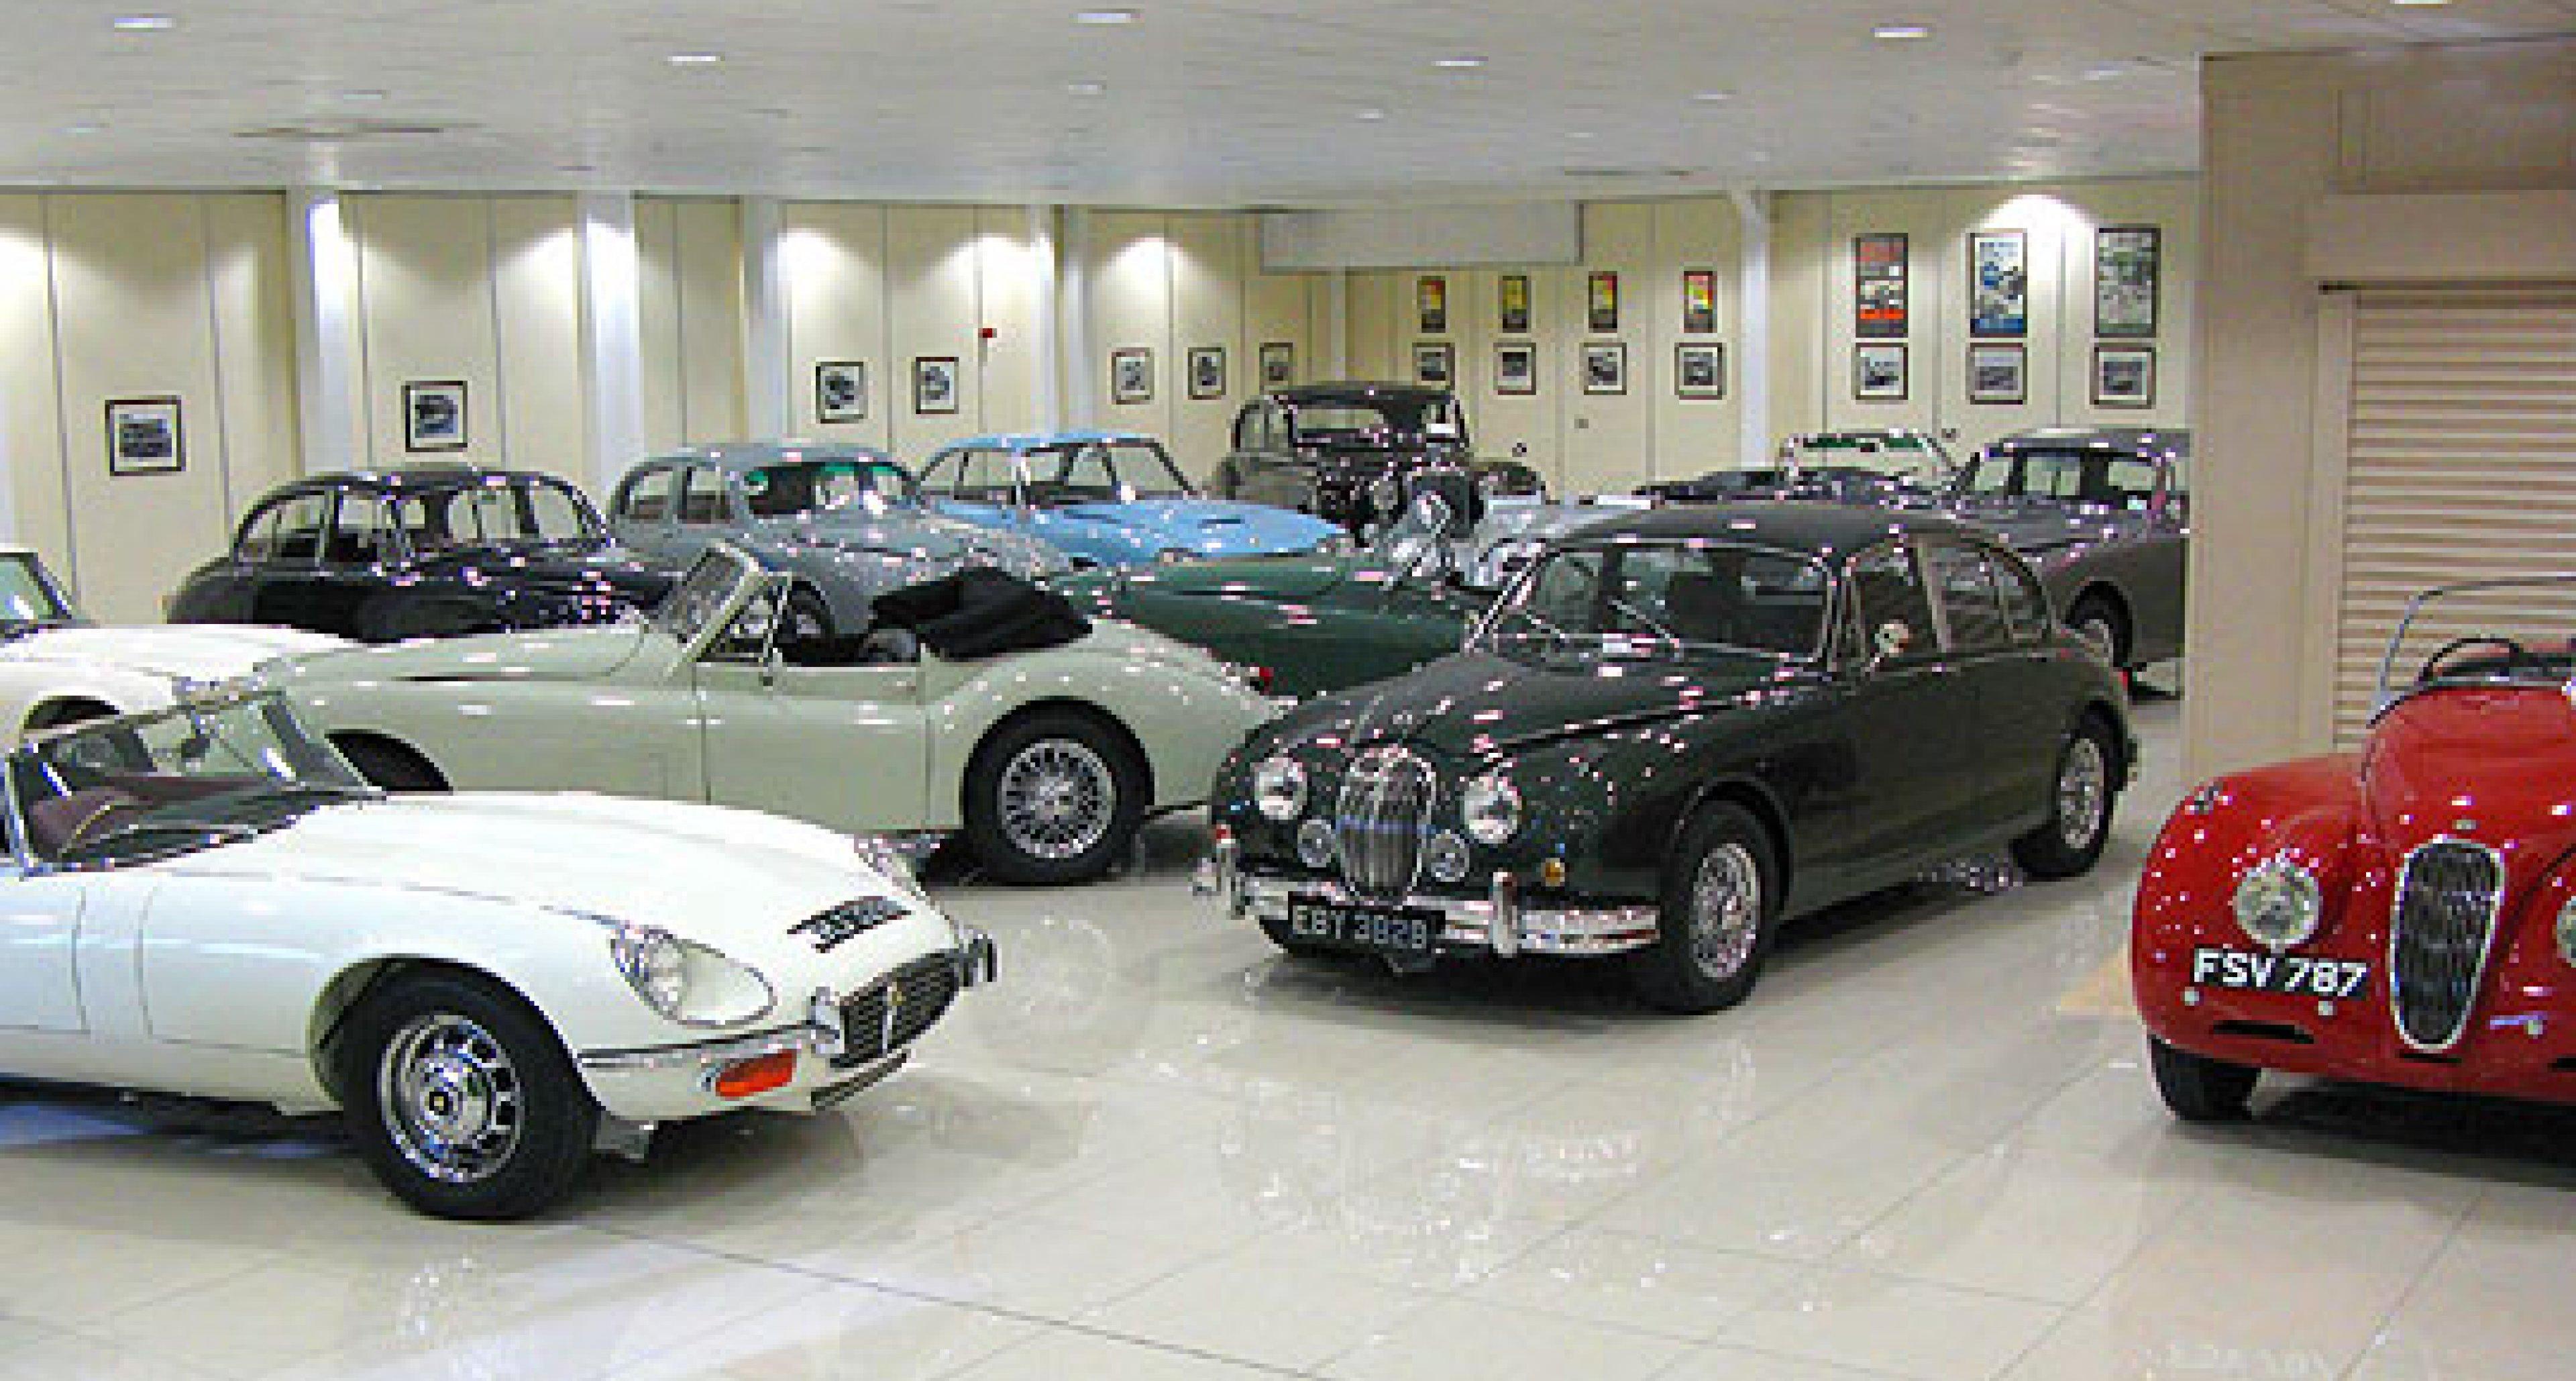 New Showroom for Classic Jaguars